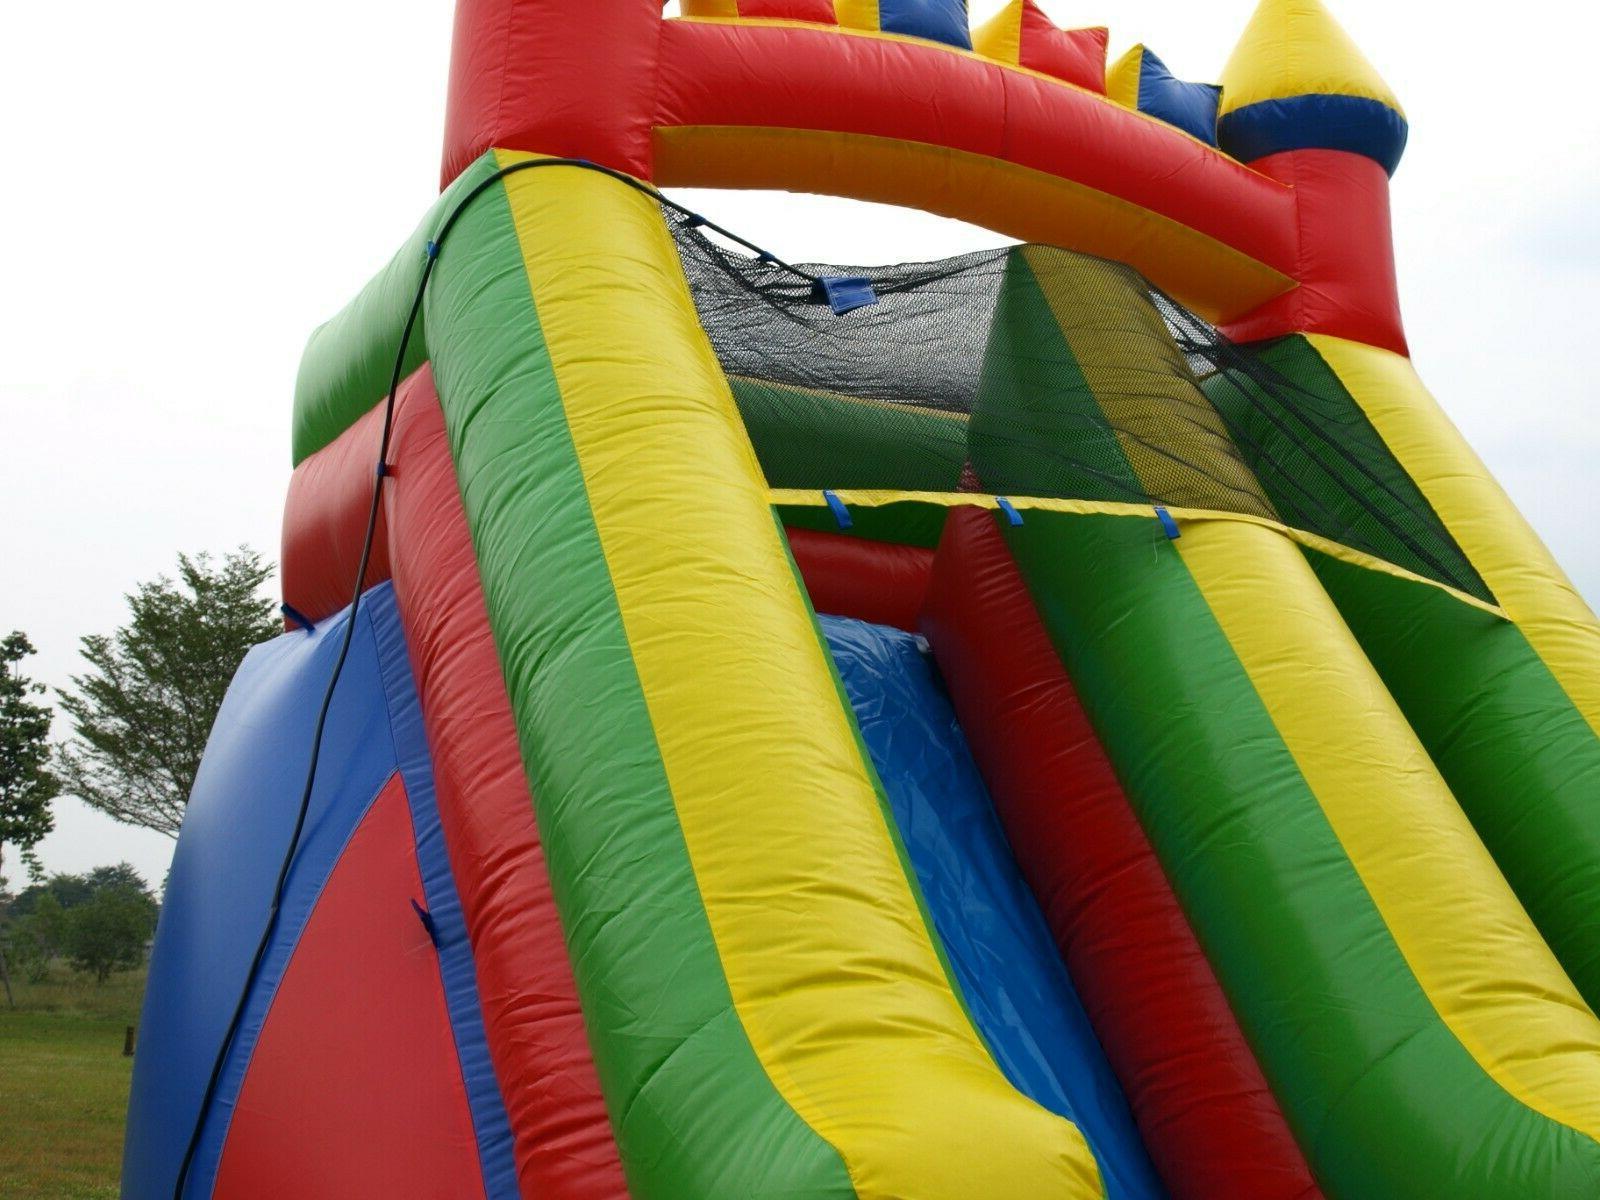 Commercial Slide Rainbow Feet Tall Blower